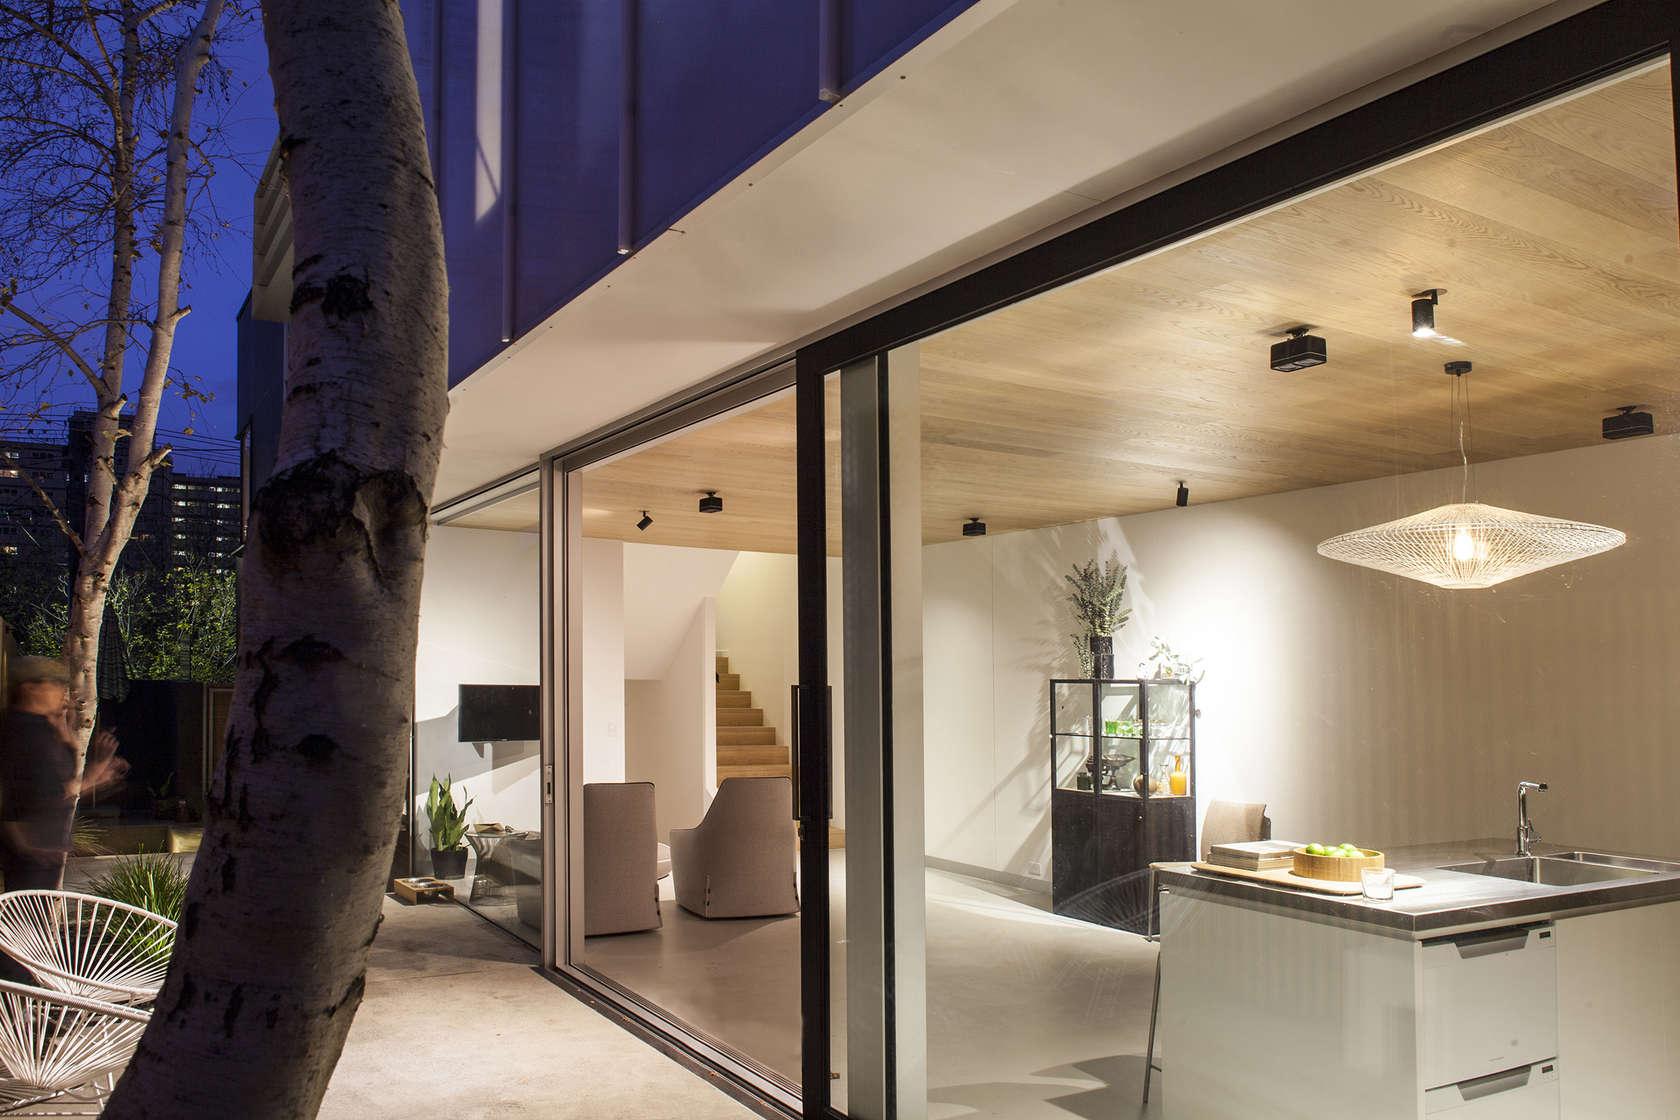 Skin-Box House by Man Architects (via Lunchbox Architect)